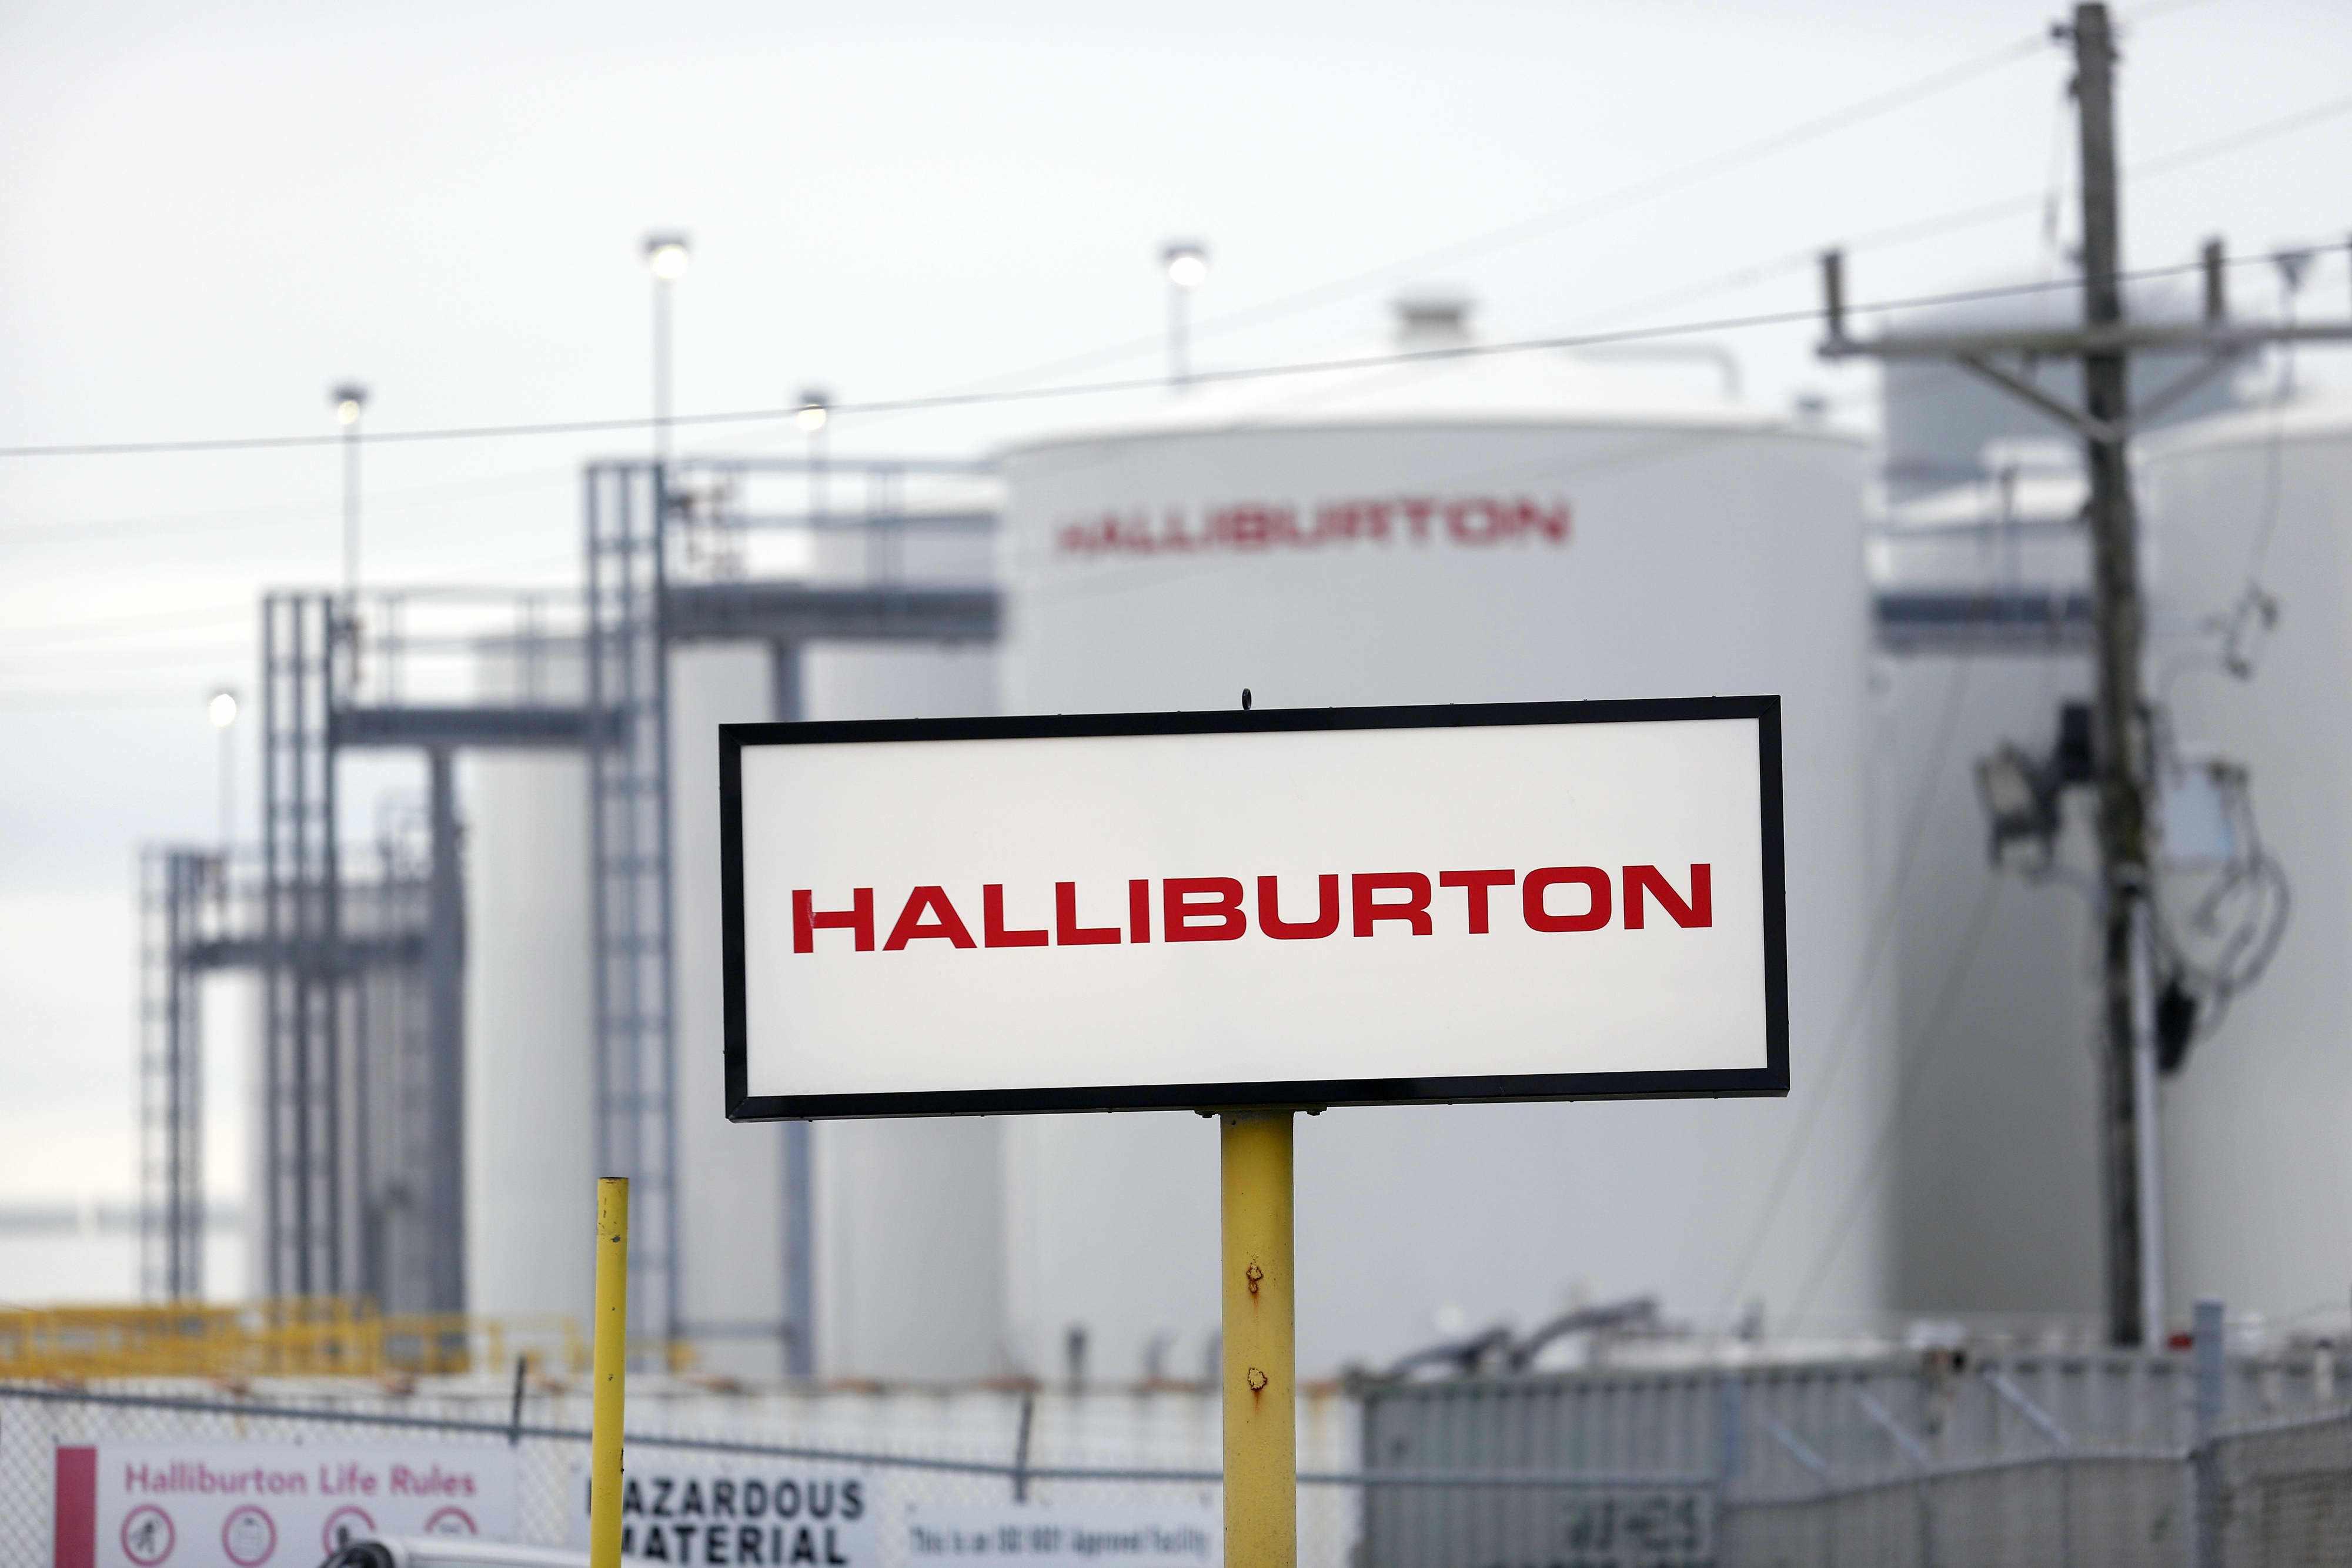 goldman halliburton dividend hike upgrades